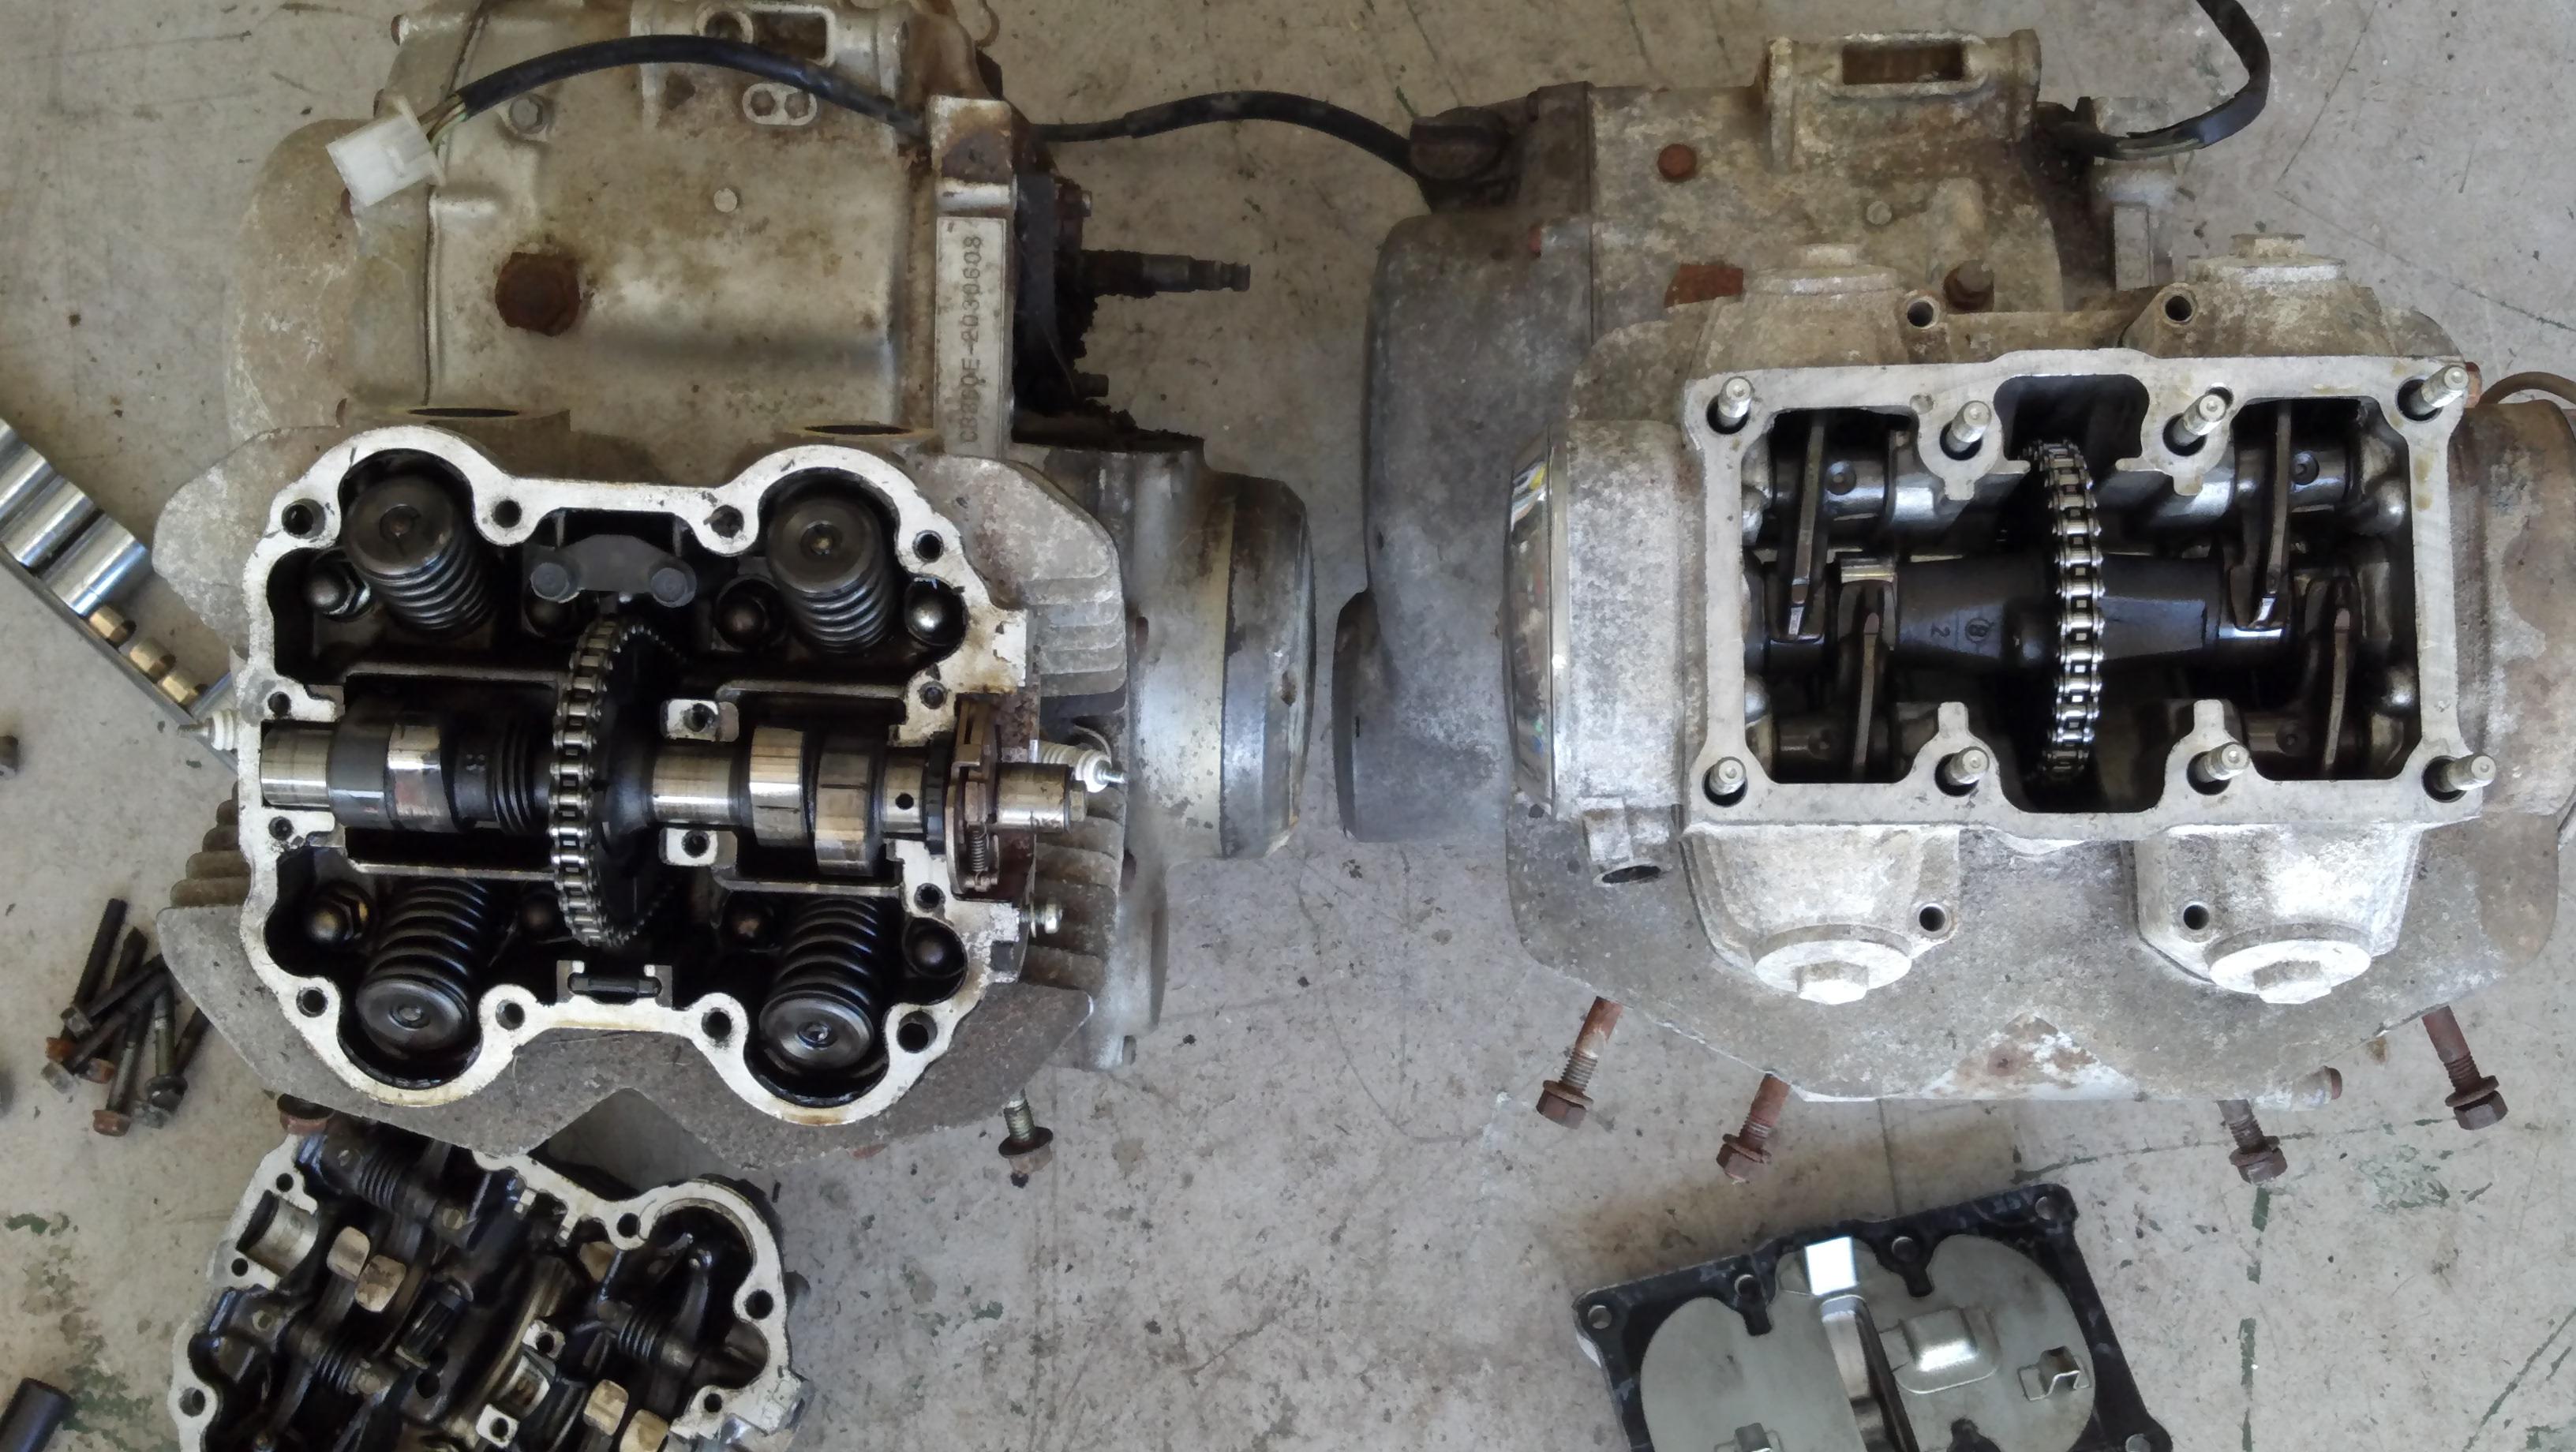 Honda 350 Vs 360 Engine Comparison Diagram Piston 2011 10 12 31